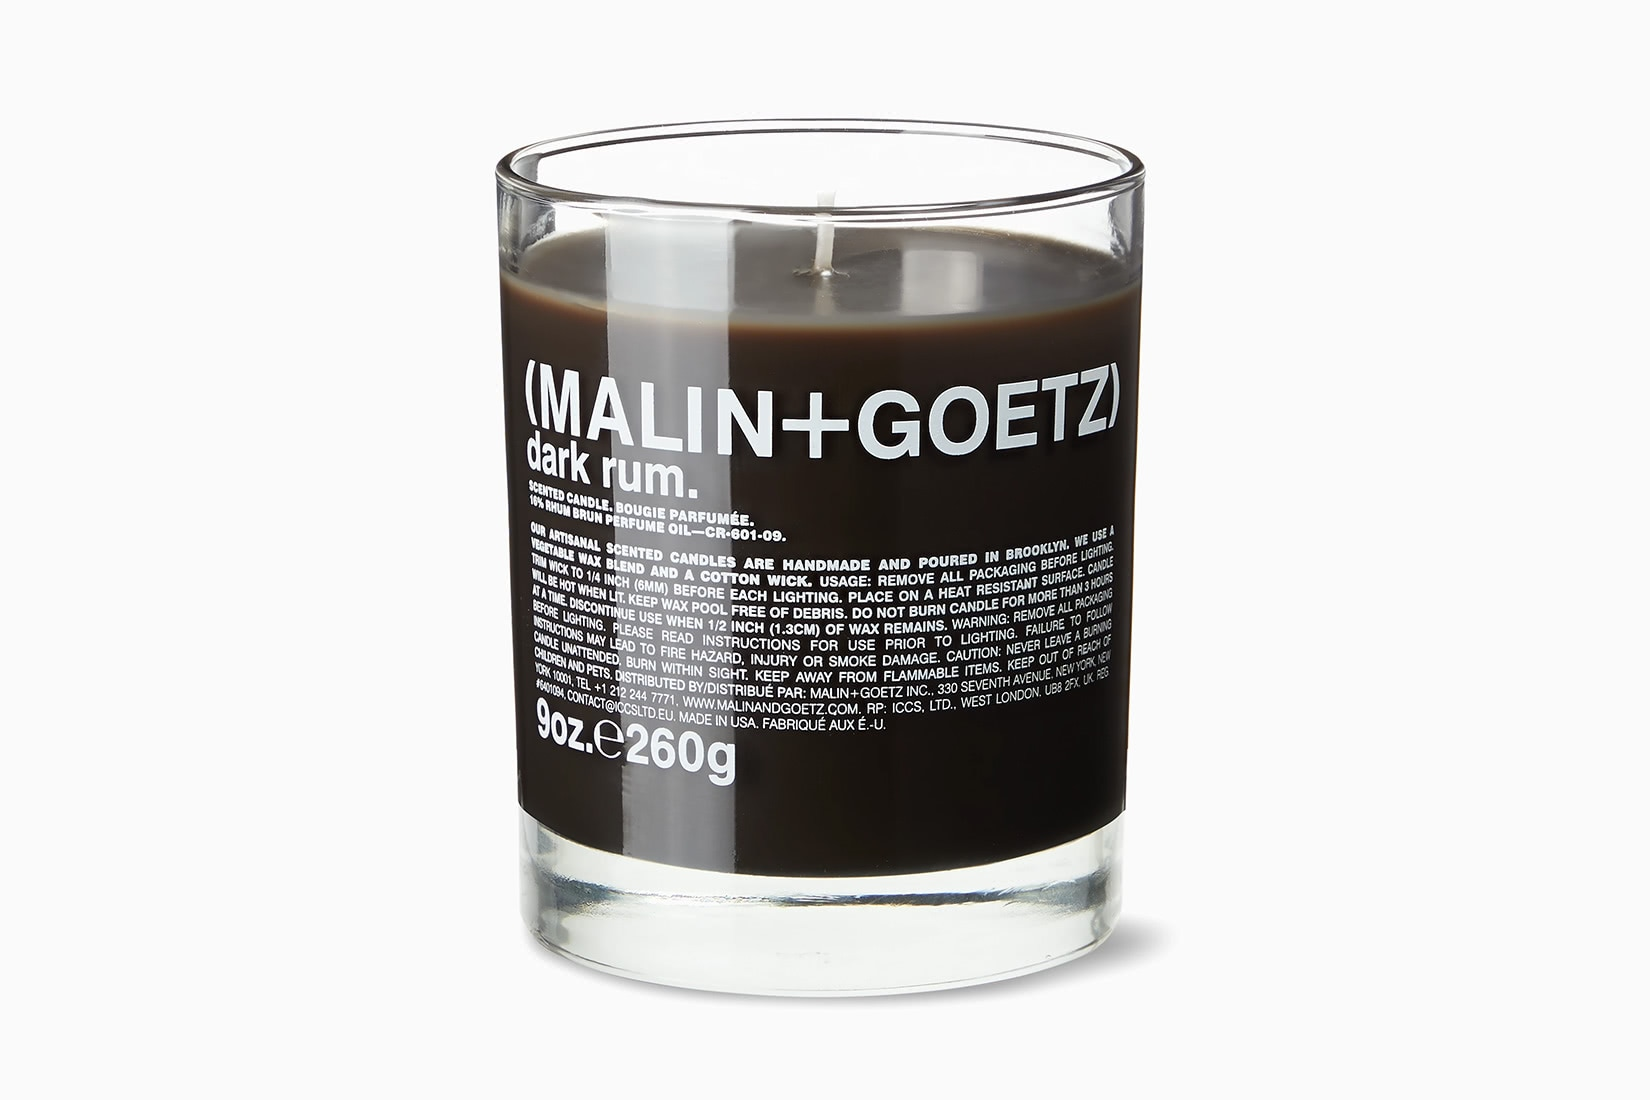 best scented candles malin + goetz dark rum home fragrance - Luxe Digital